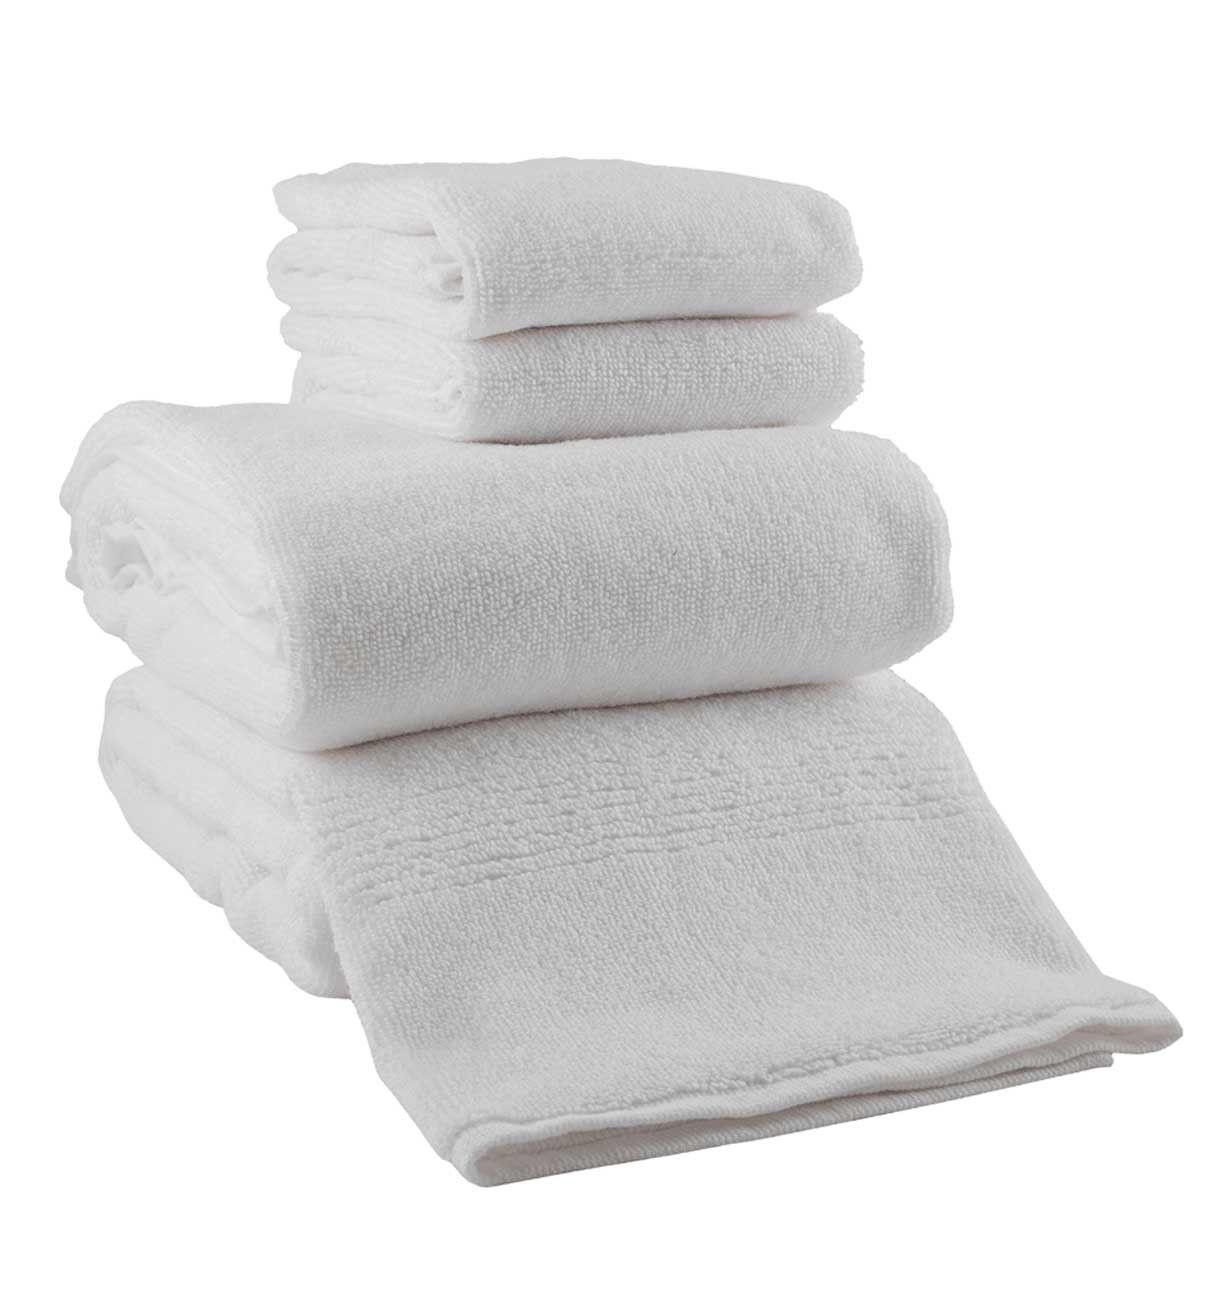 By Adab Bath Towels Towels Online Bath Linens